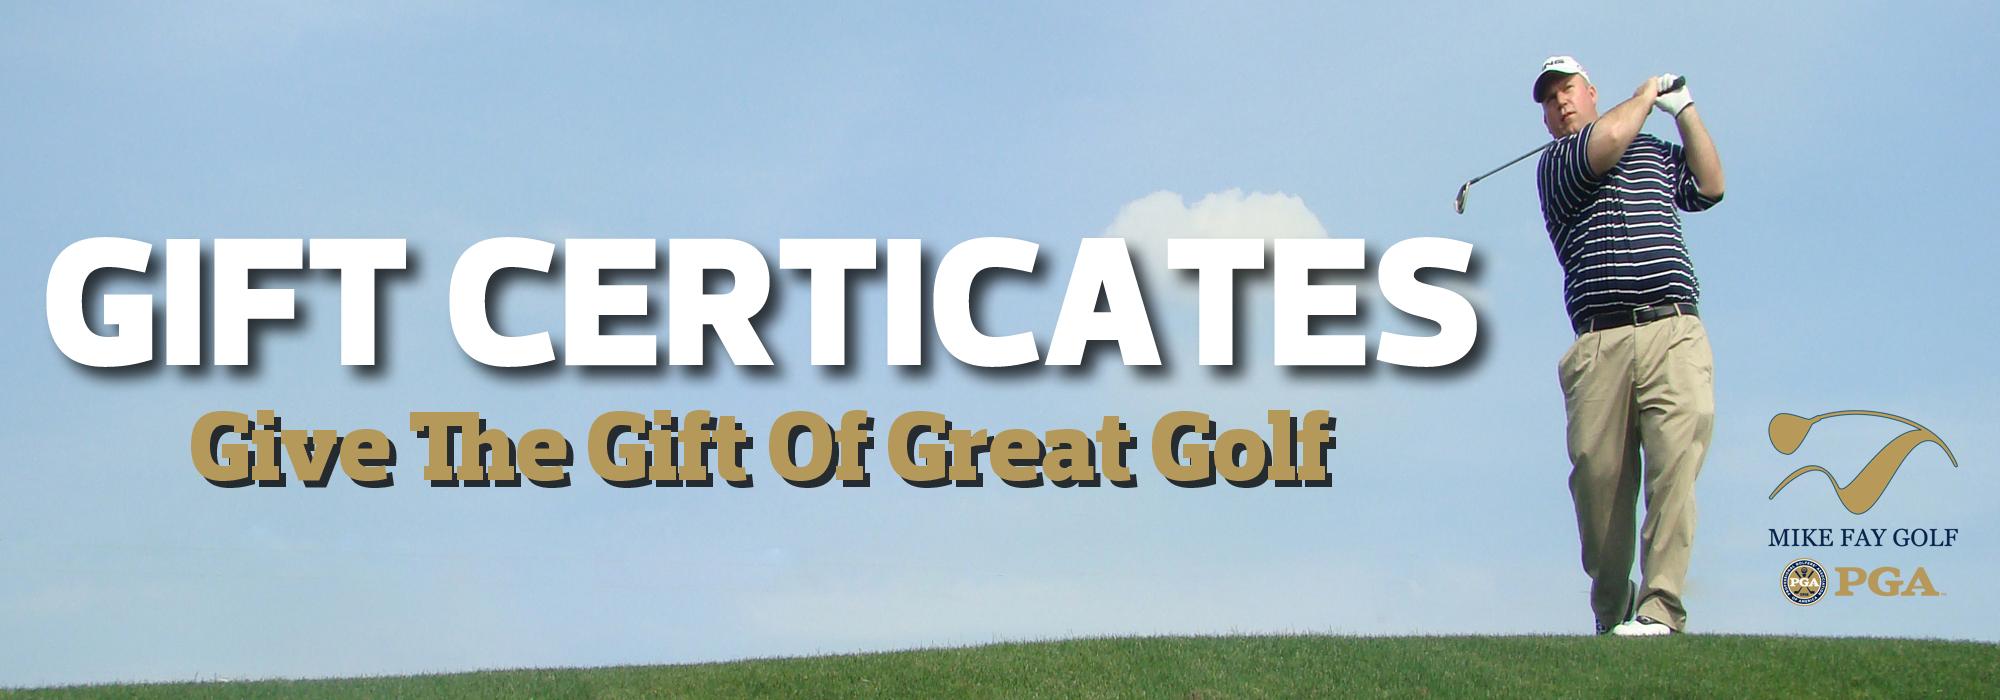 MFG Gift Certificates